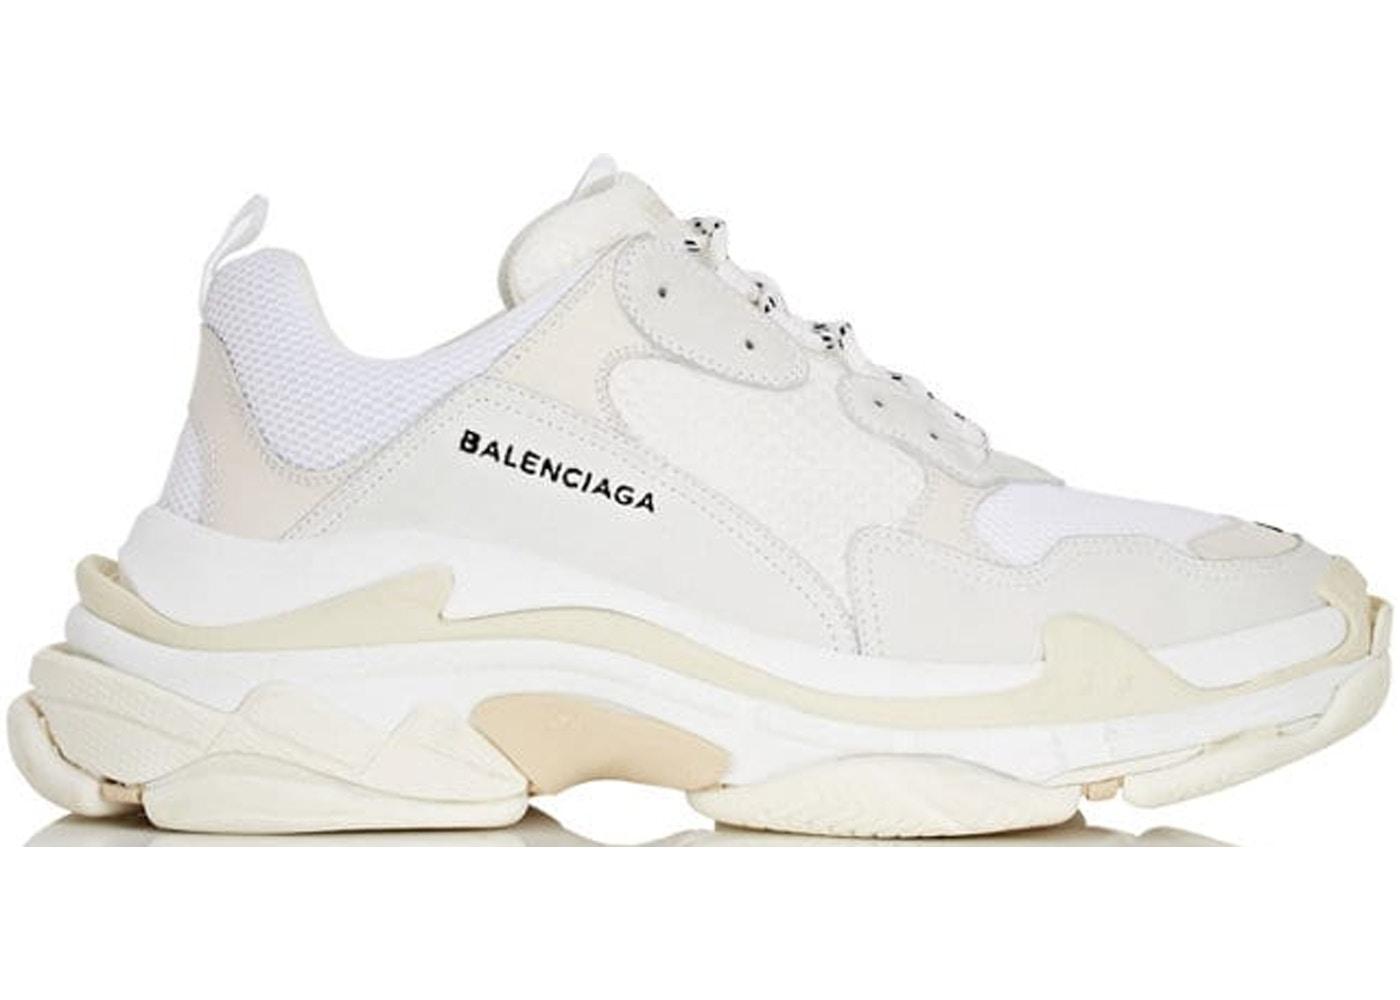 f3cddb3183 Balenciaga Triple S White - 483546W06F19000